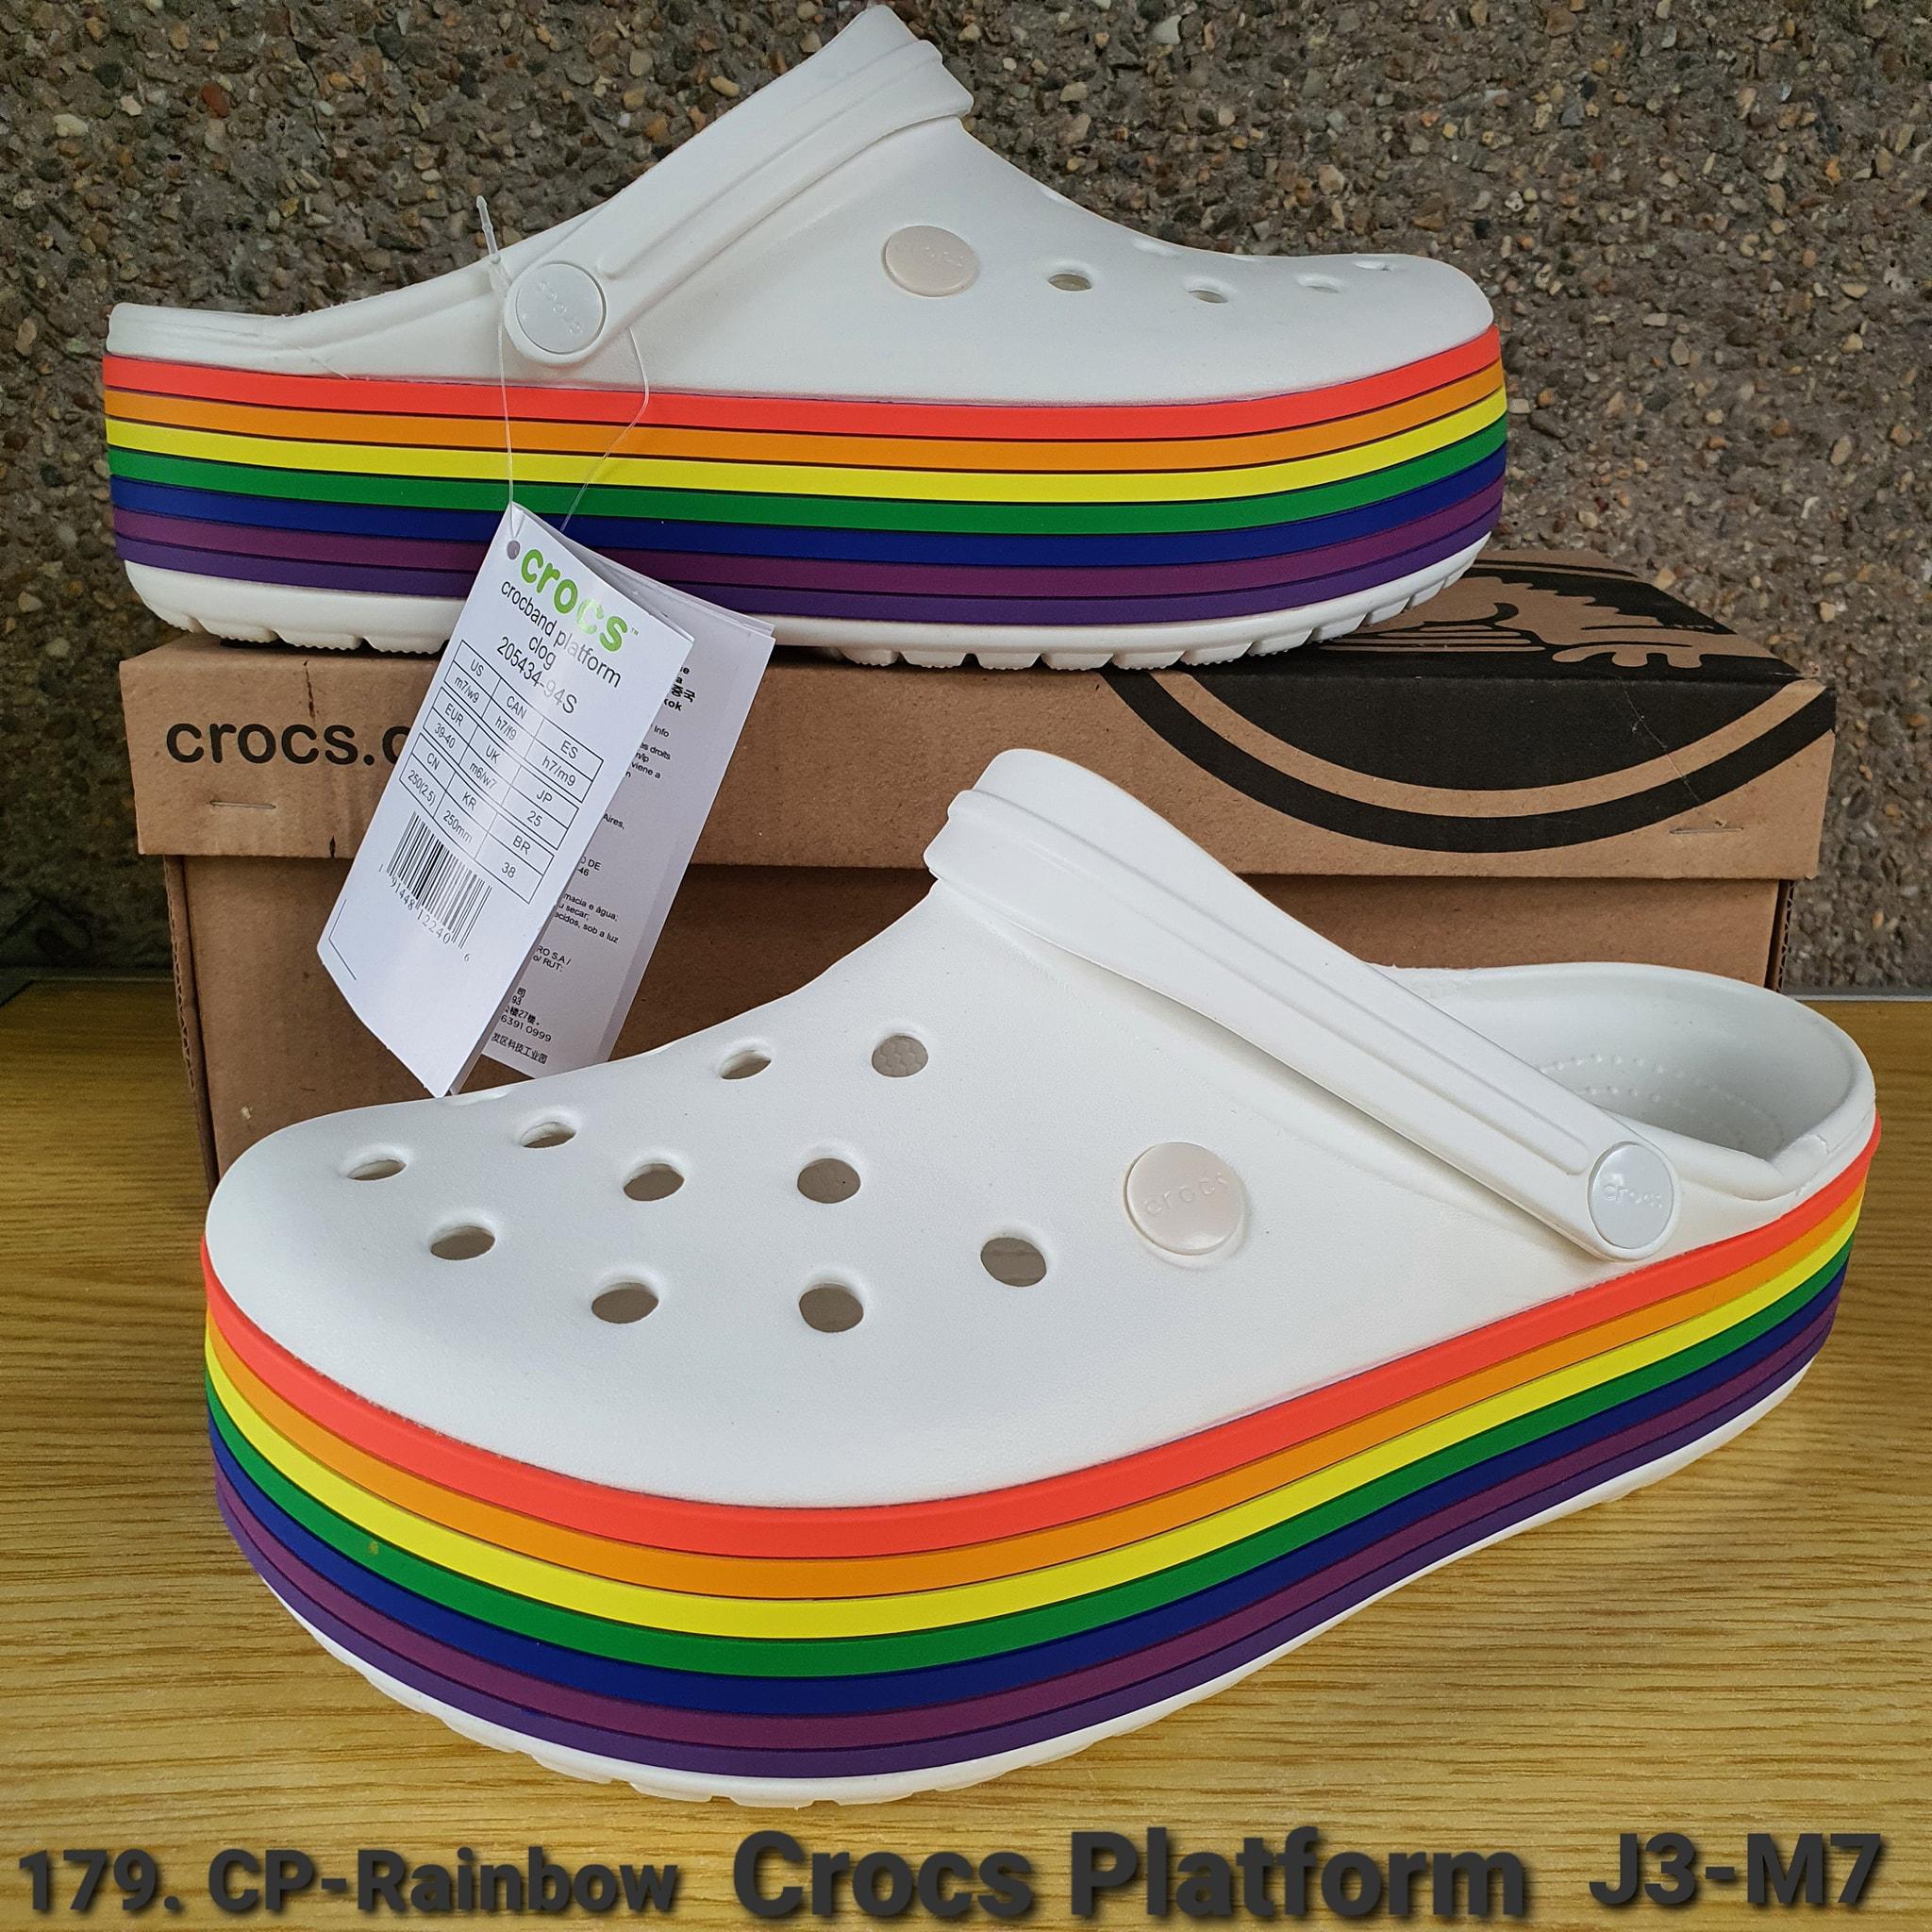 Crocs 179. CP-Rainbow Crocband Platform